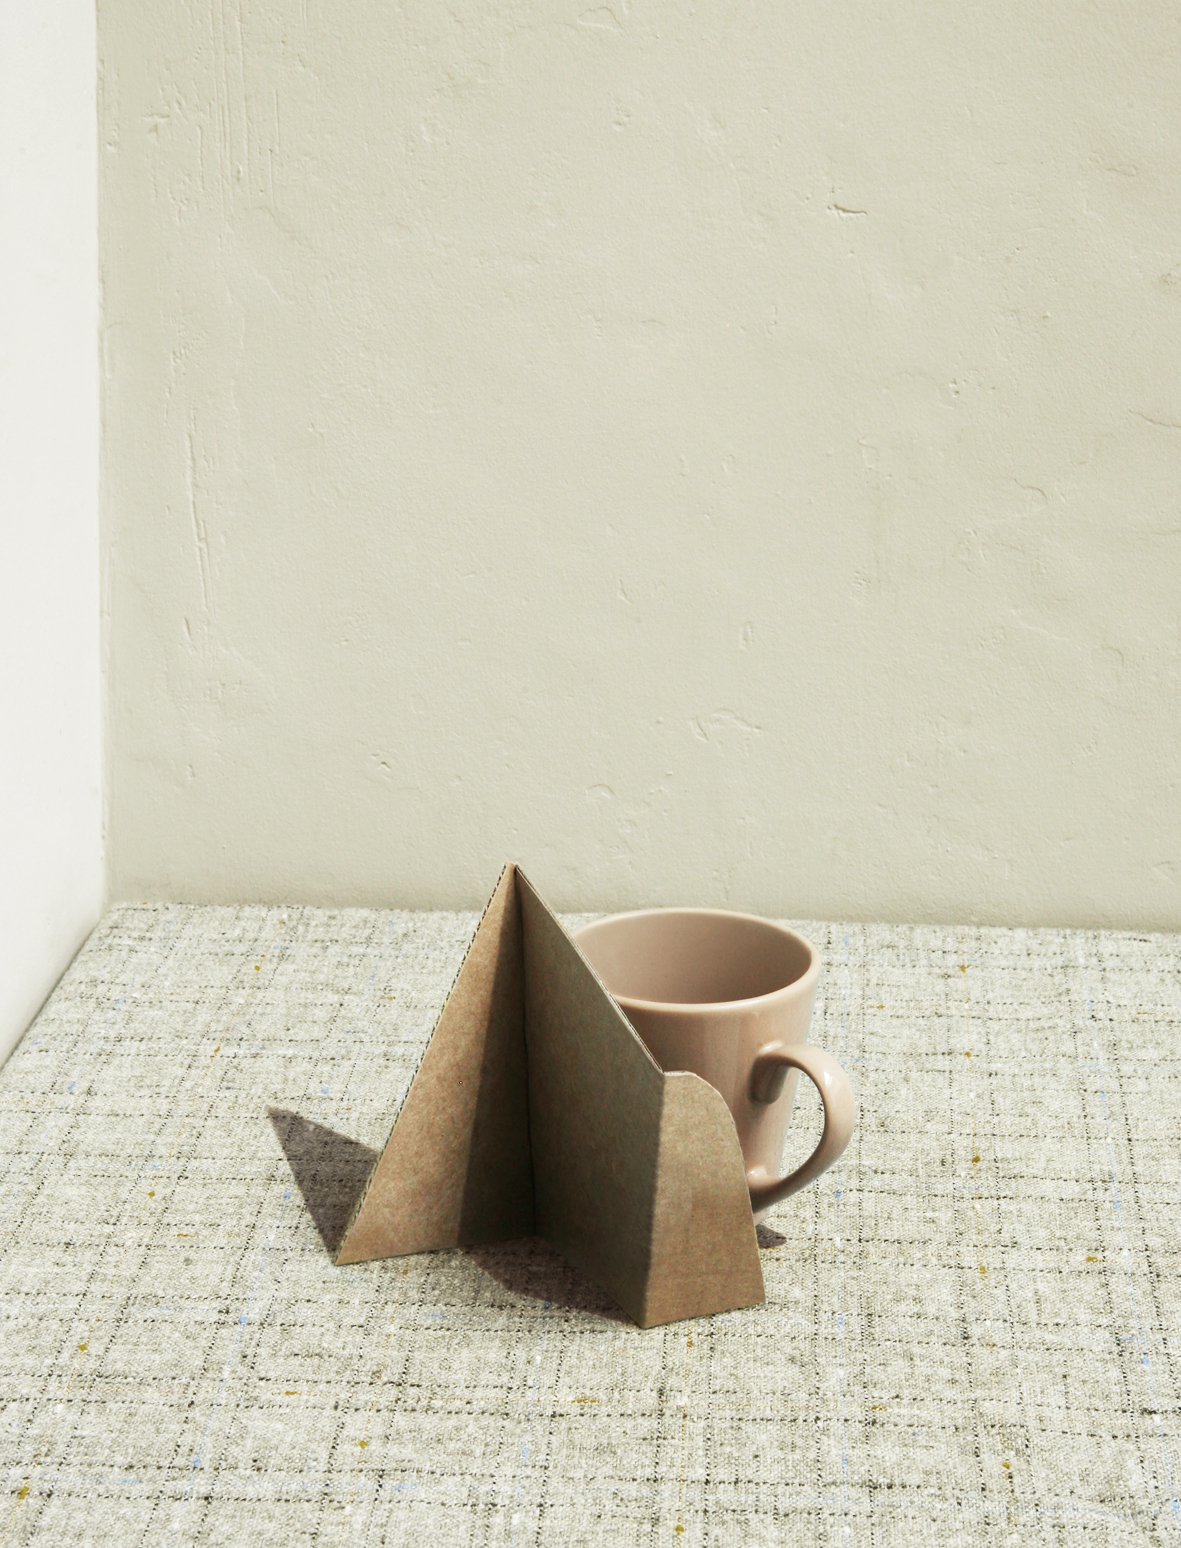 still-cupcarton-1b